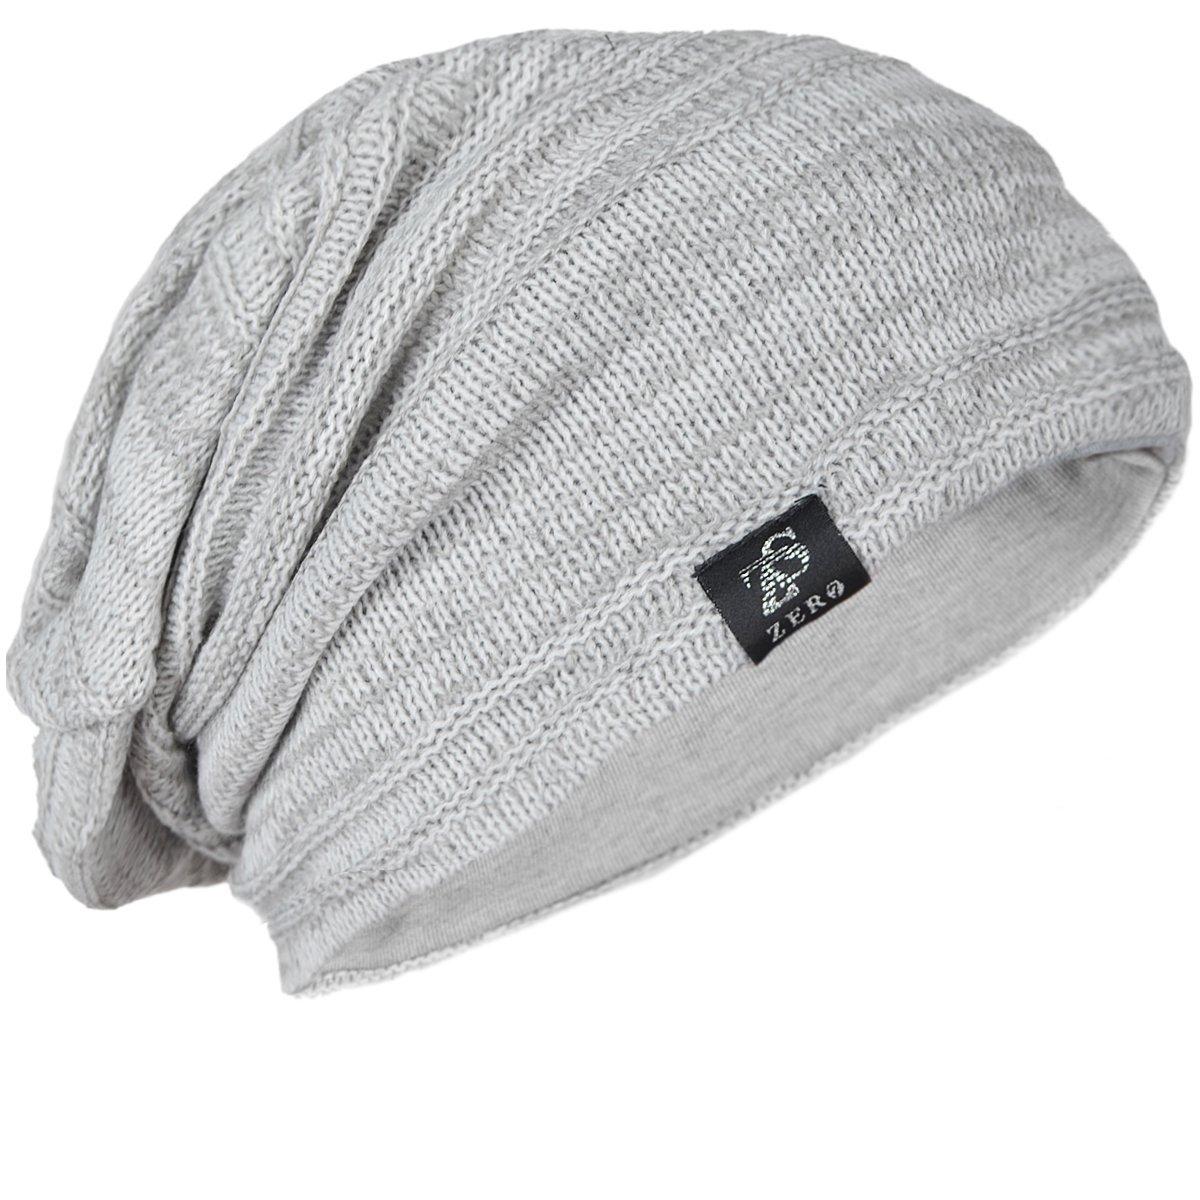 26846de9243fa9 Z&S Vintage Men Baggy Beanie Slouchy Knit Skull Cap Hat (Light Gray with  White)